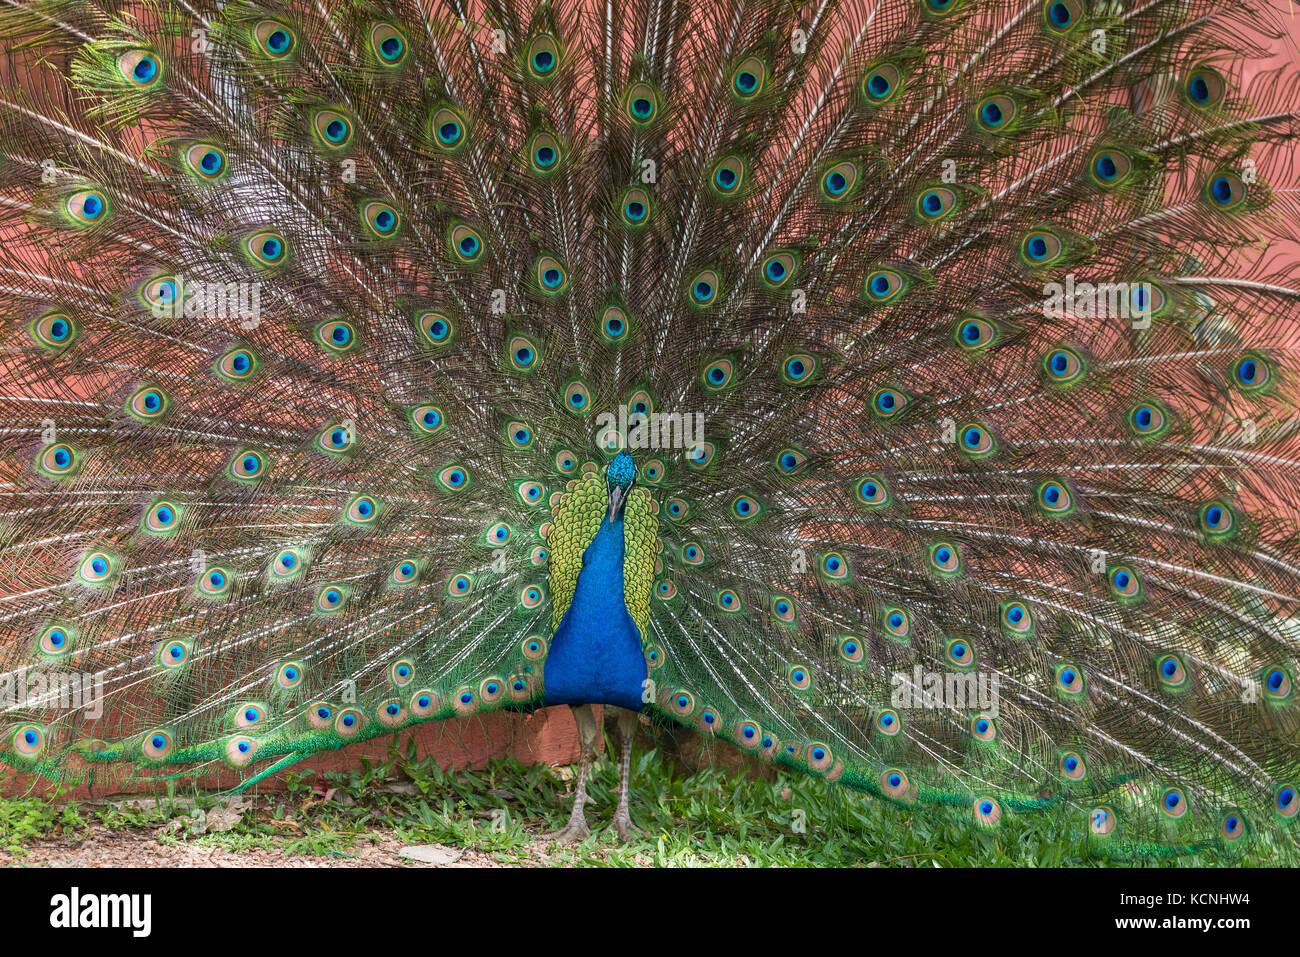 Indian peacock, Vale dos Vinhedos, Grande do Sul, Brazil Stock Photo